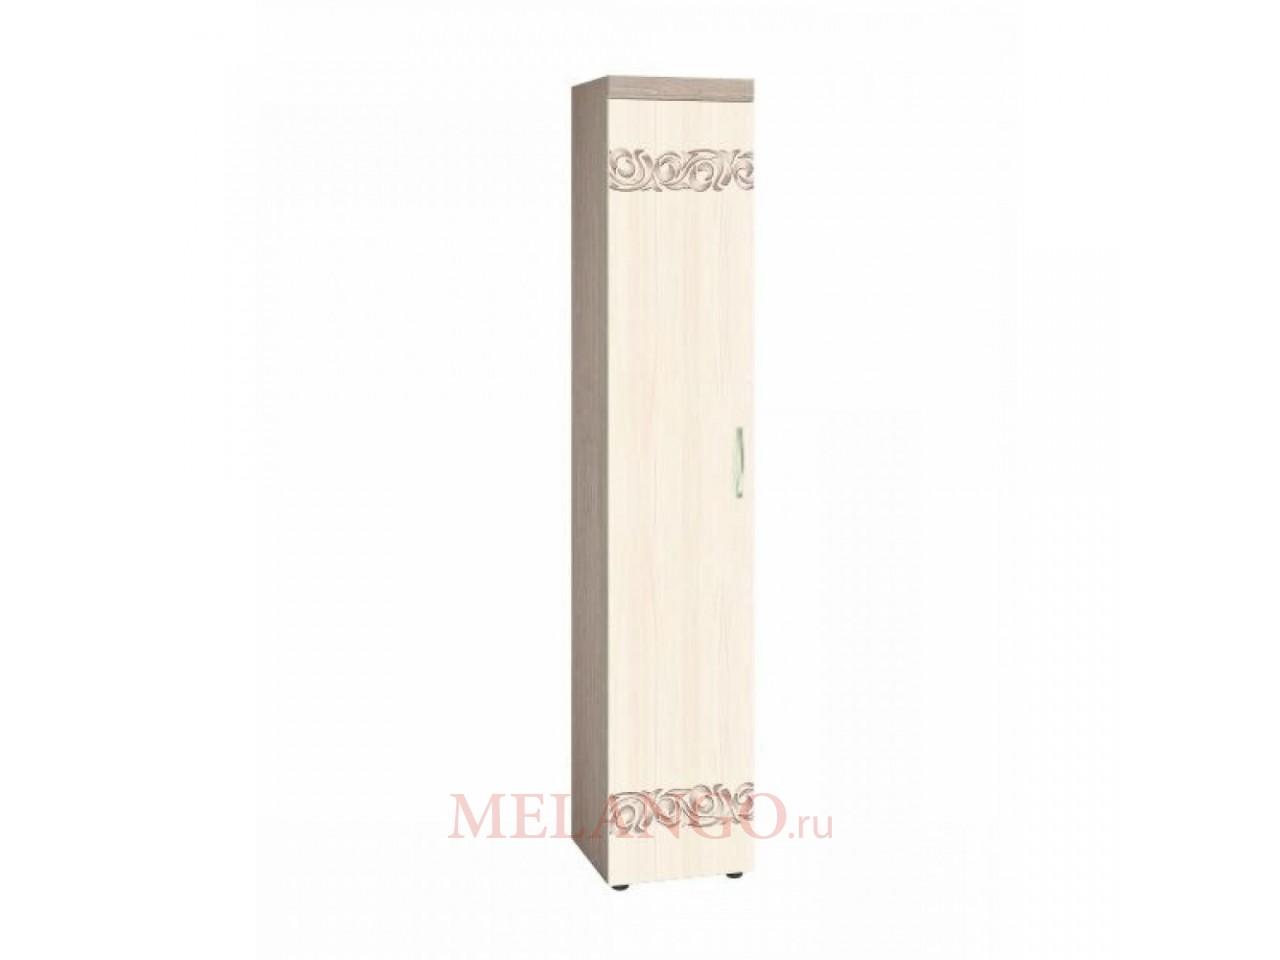 Шкаф-пенал Мэри 39.06 левый